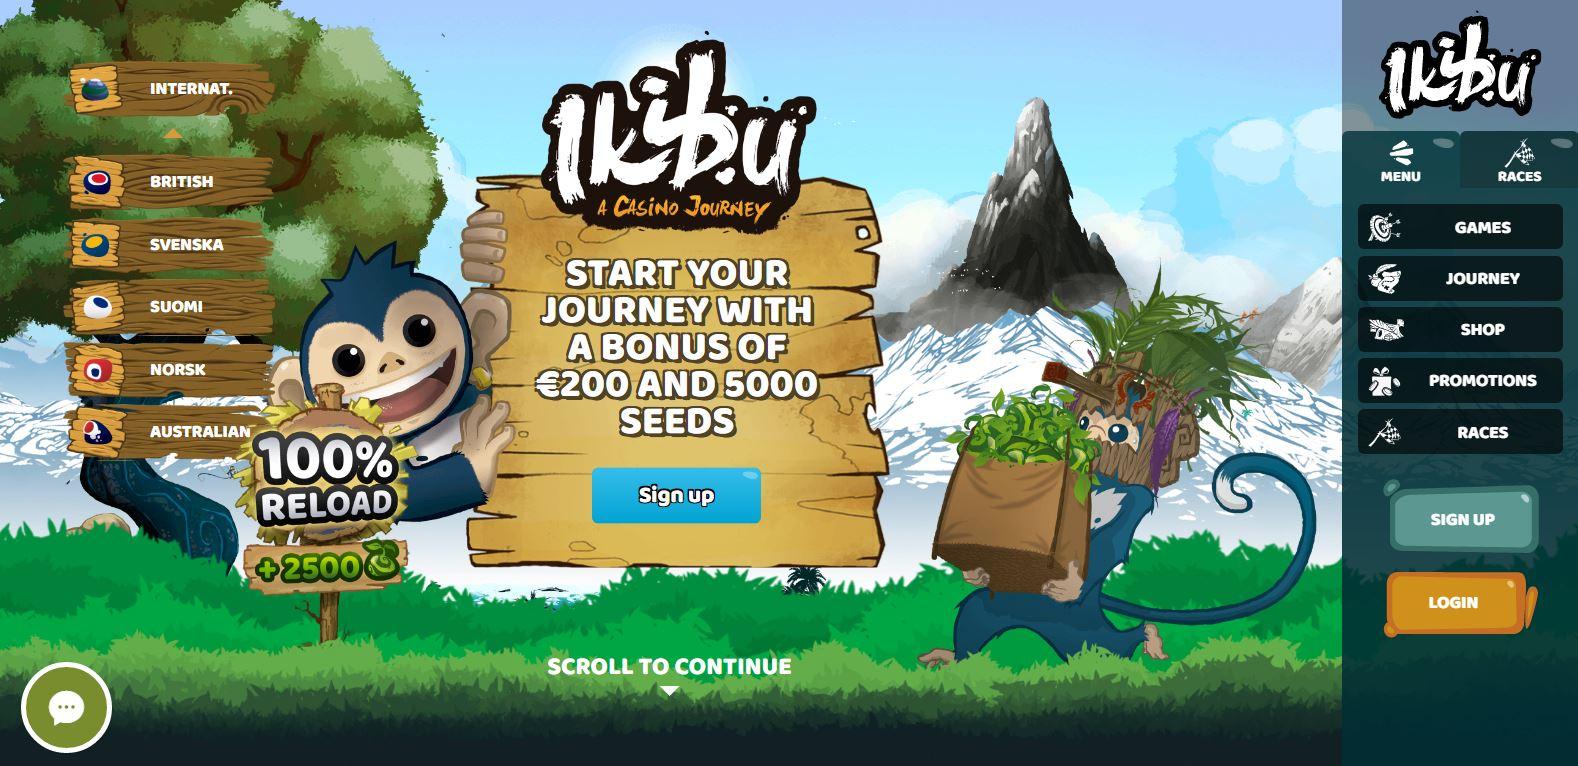 Ikibu Casino sign up bonus